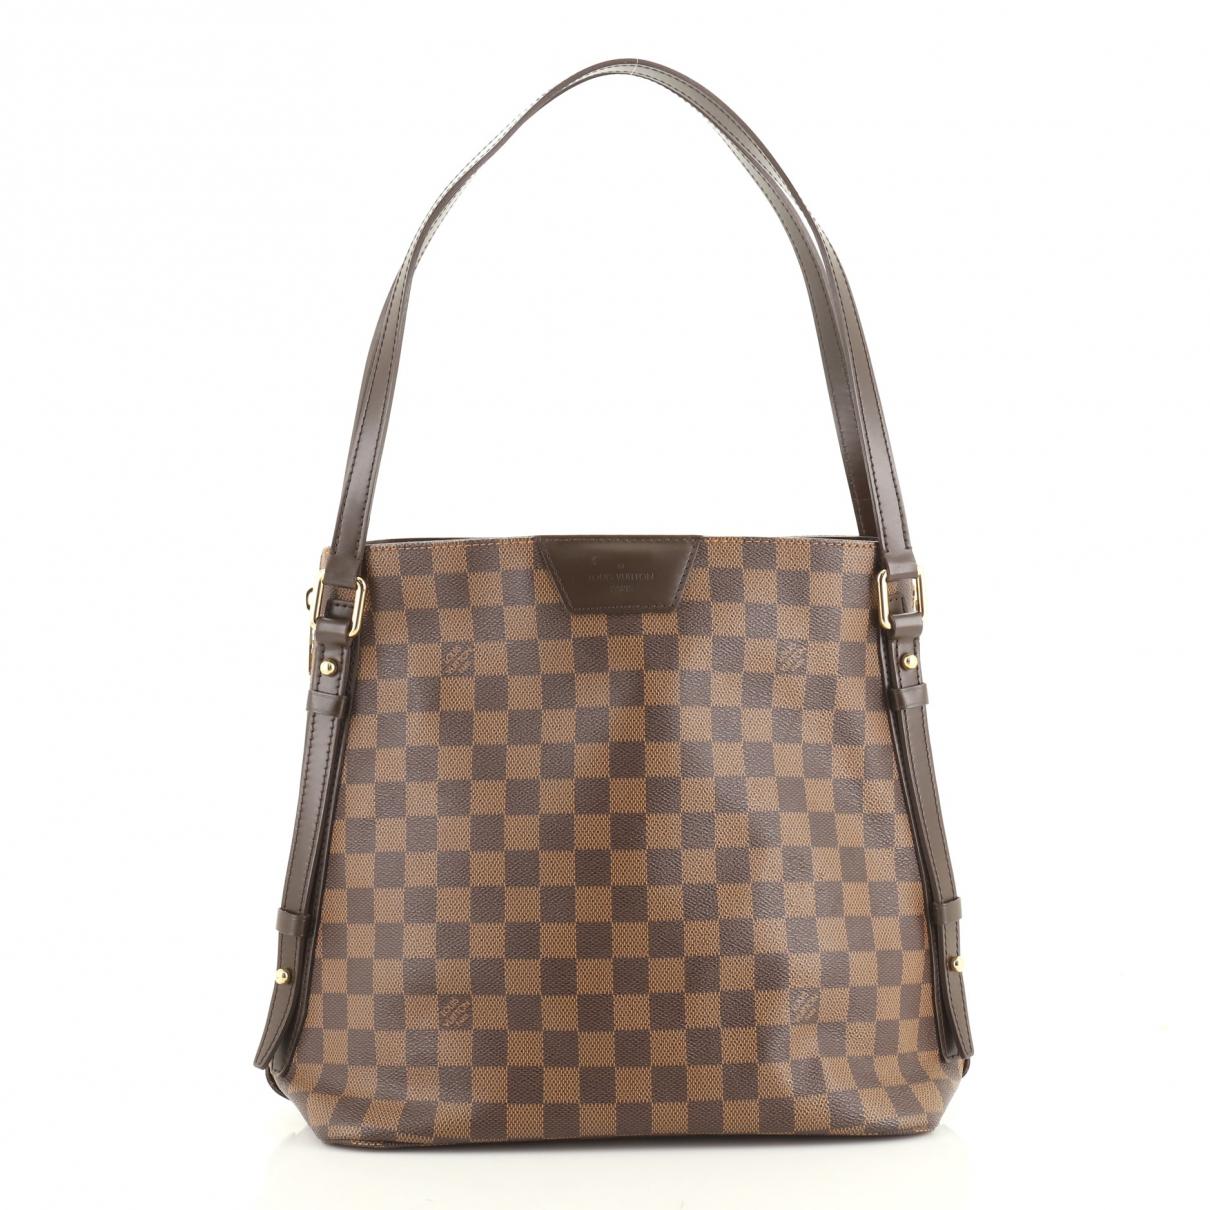 Louis Vuitton \N Brown Leather handbag for Women \N